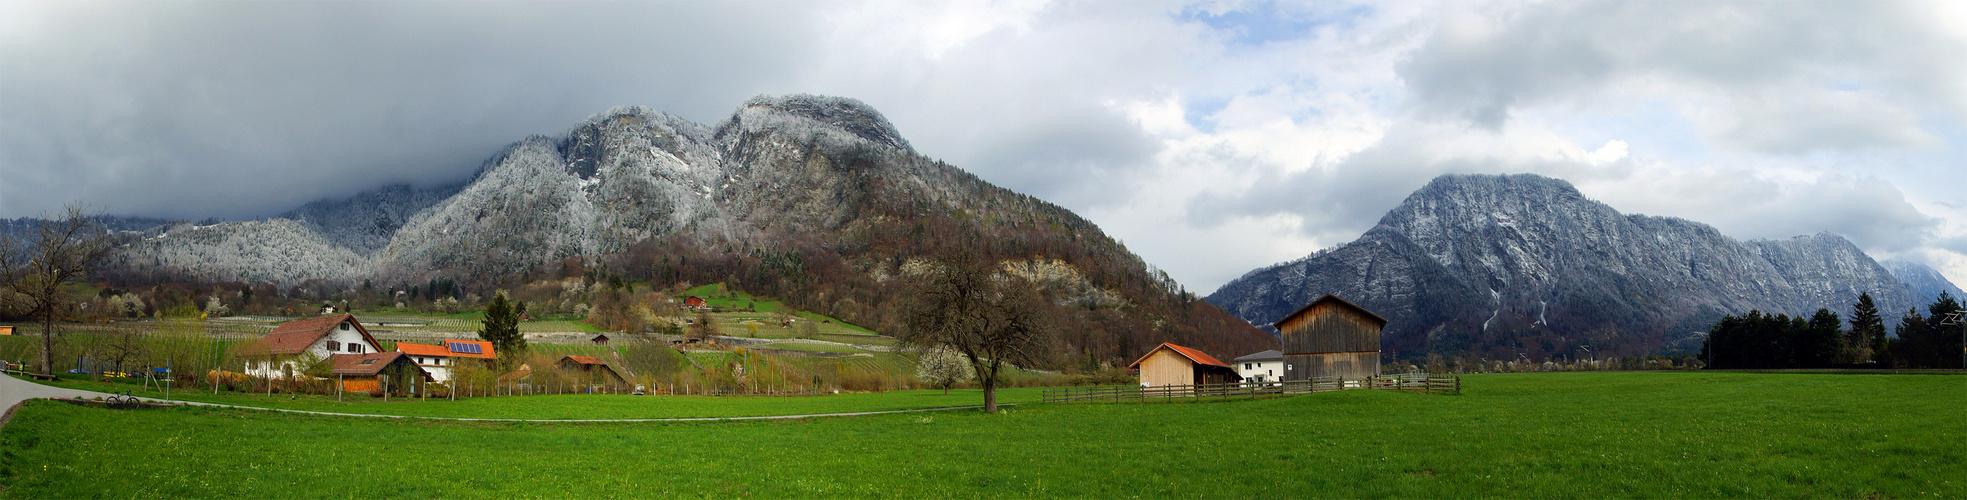 Weissgrüne Ostern in Malans Graubünden